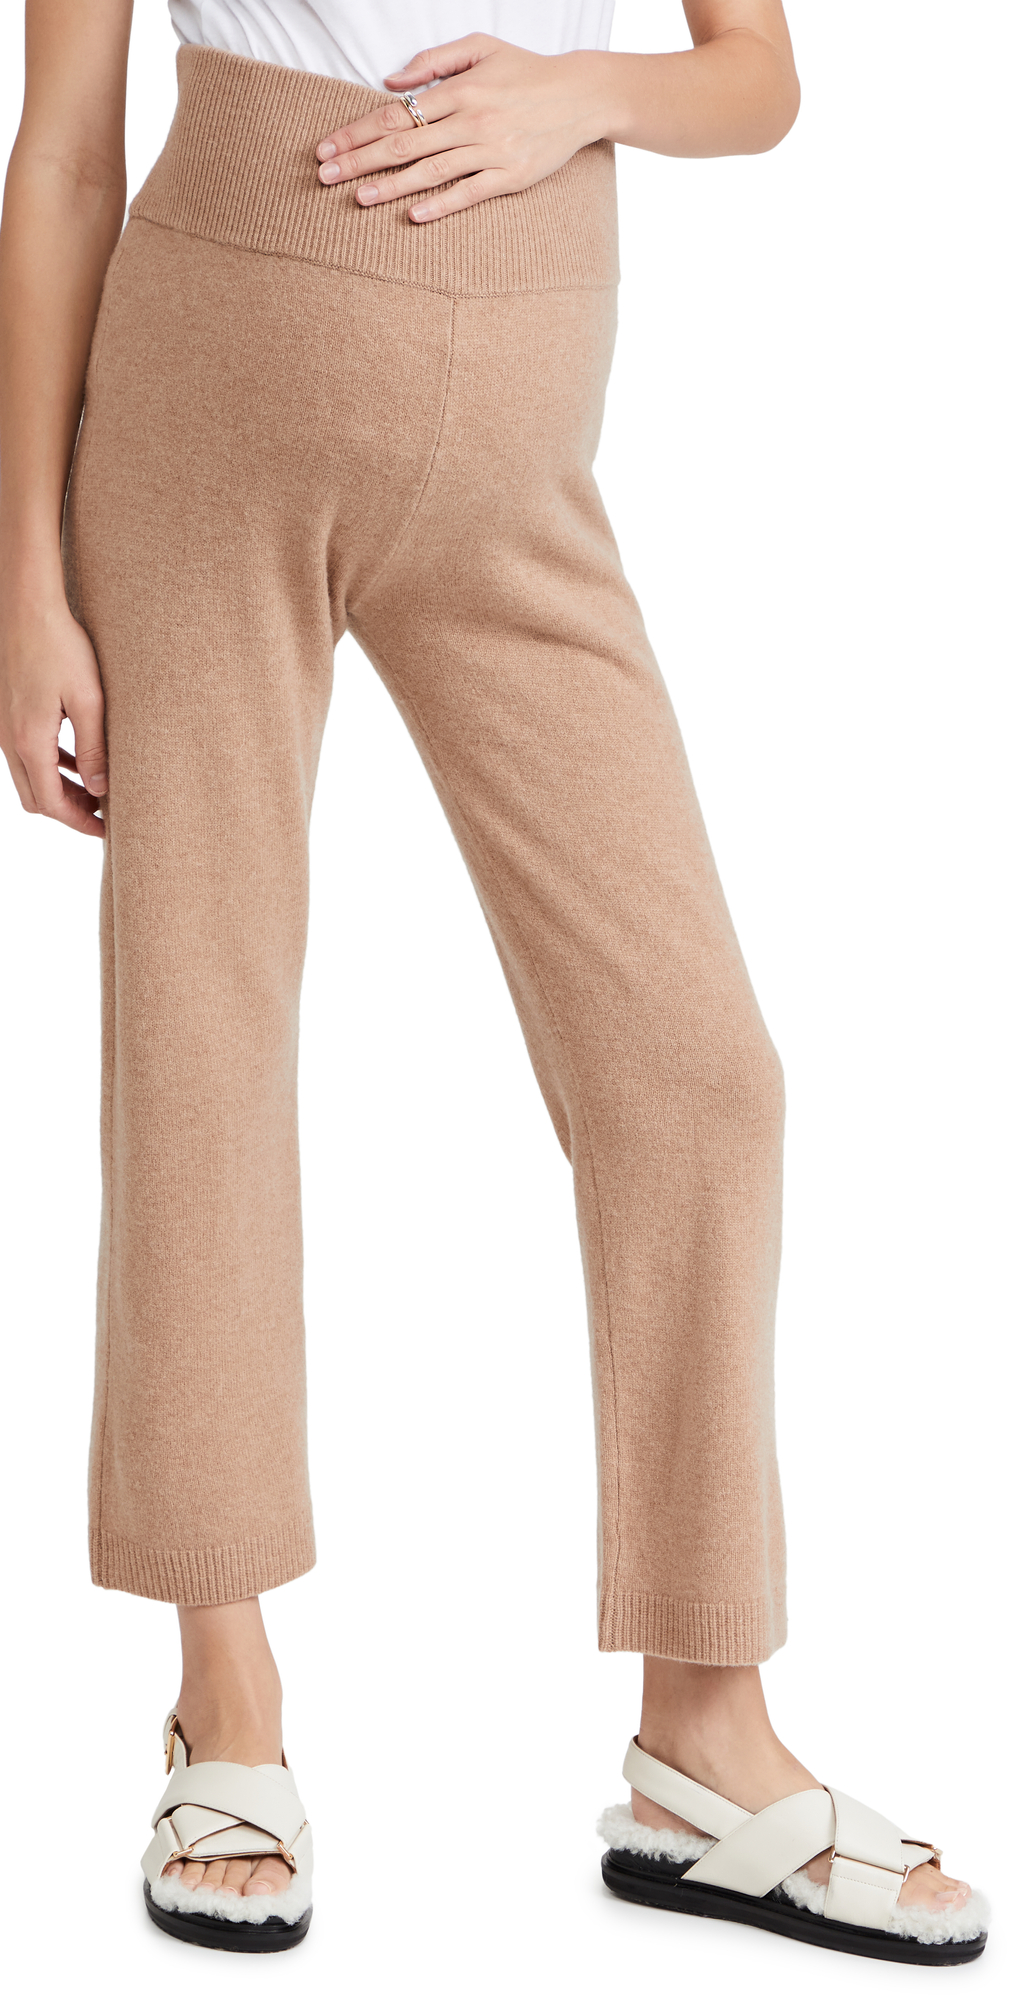 The Austen Pants